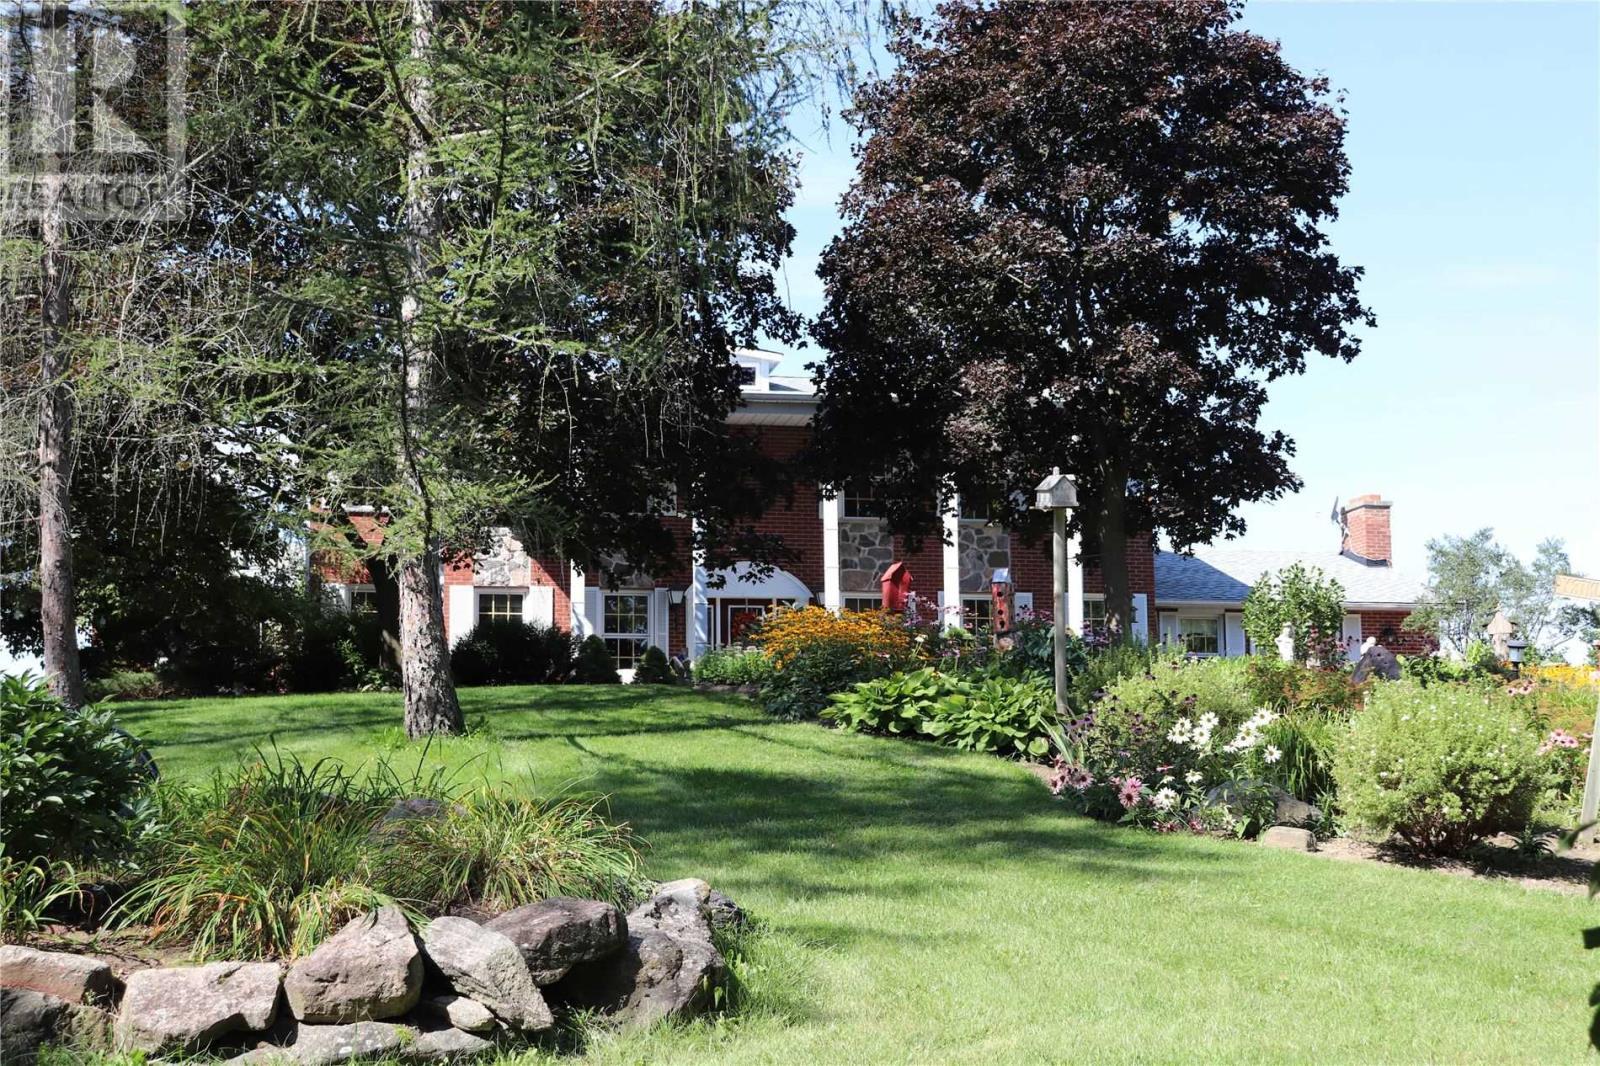 1510 Concession Road 5 Rd, Adjala-Tosorontio, Ontario  L0G 1L0 - Photo 2 - N4704945